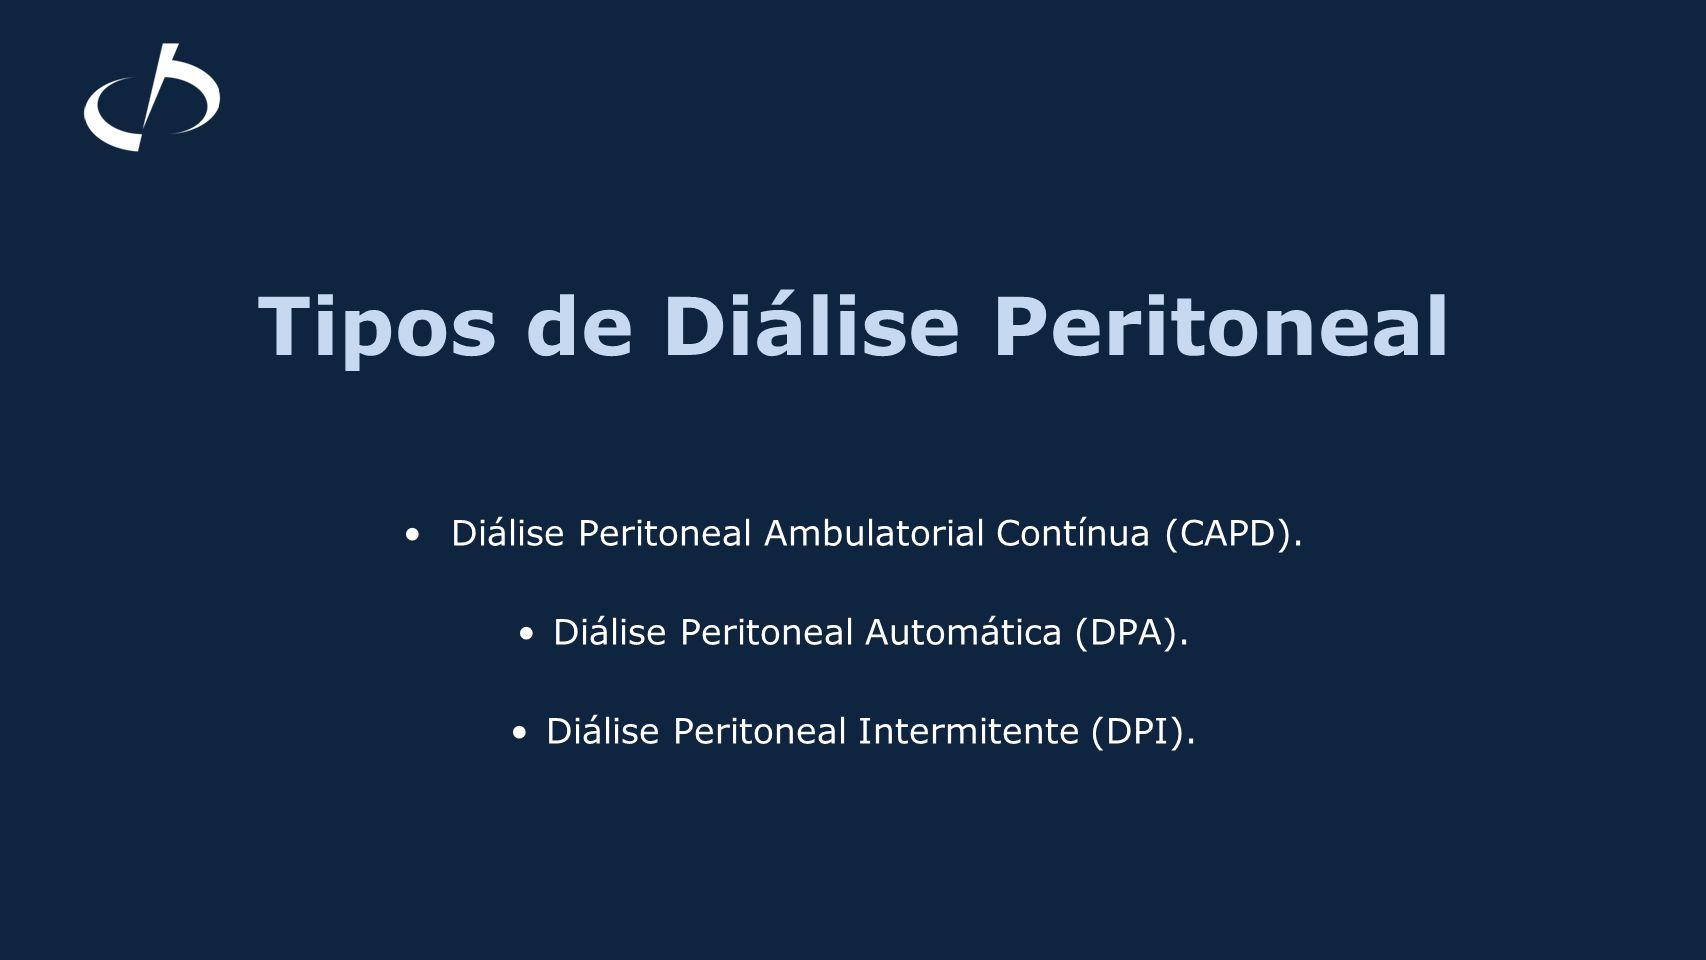 Tipos de Diálise Peritoneal Diálise Peritoneal Ambulatorial Contínua (CAPD). Diálise Peritoneal Automática (DPA). Diálise Peritoneal Intermitente (DPI